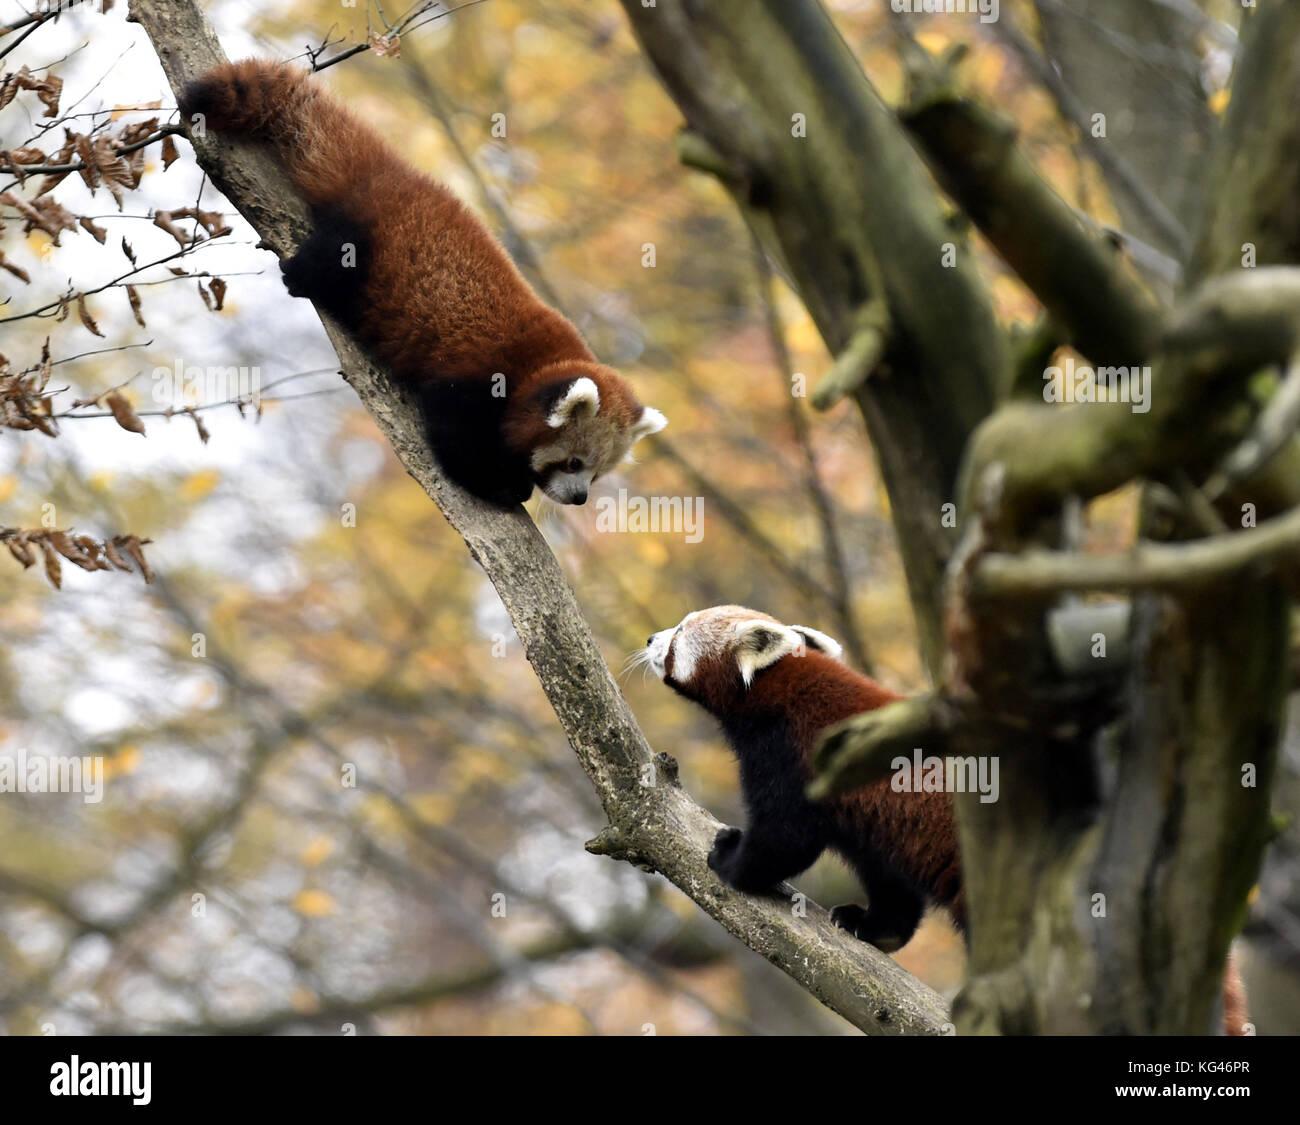 Zlin, Czech Republic. 03rd Nov, 2017. Red panda cub (left) sits in a tree in the zoo Zlin, Czech Republic, November - Stock Image